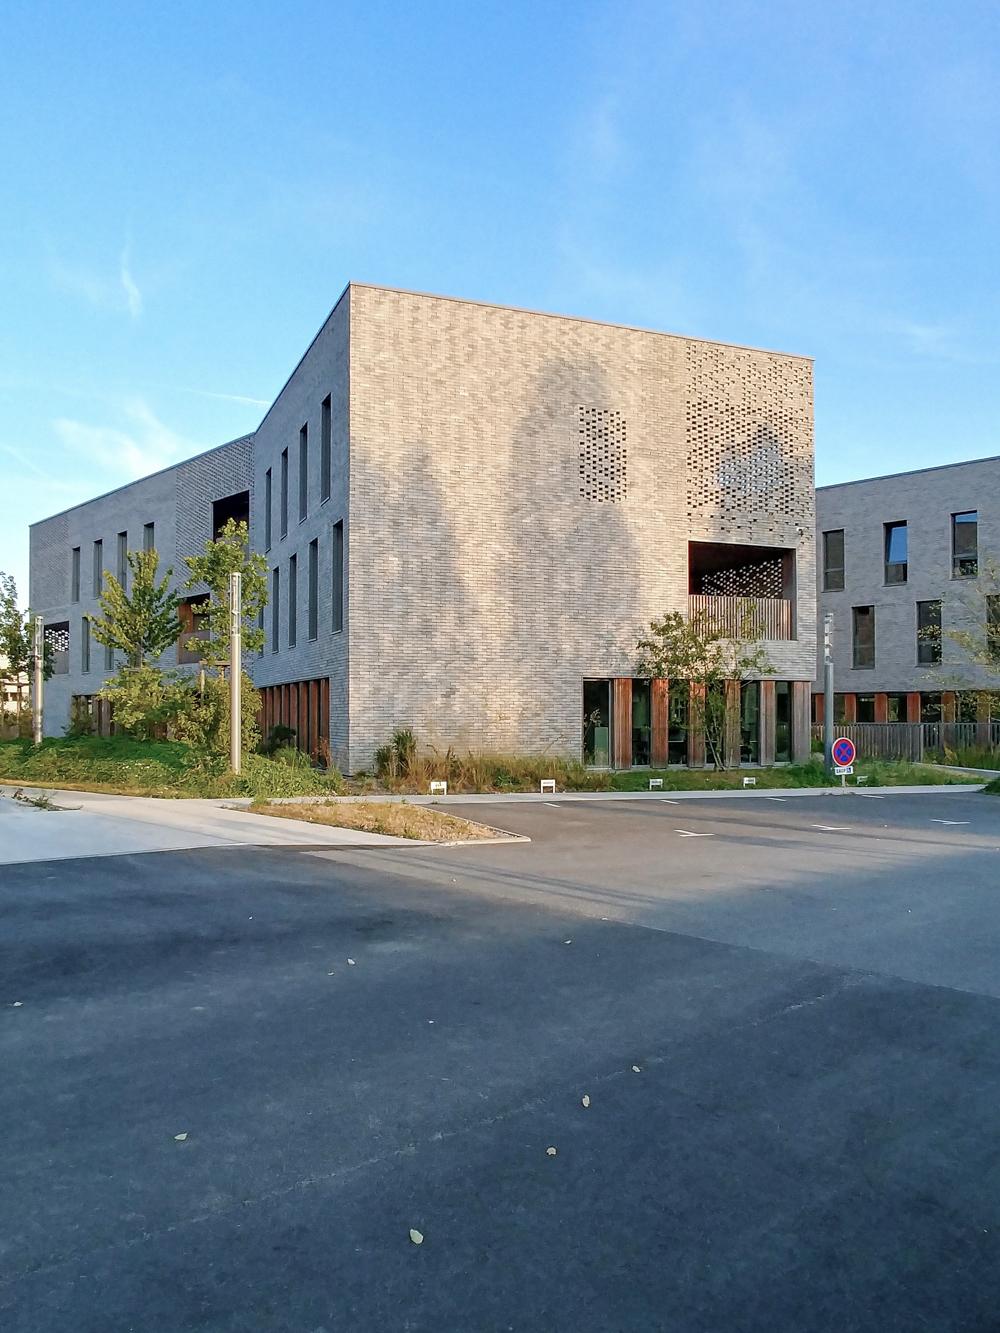 photographe d'architecture ©INTERVALphoto : forma6, immeubles tertiaires, Saint Herblain *déambulation (reportage express portable)